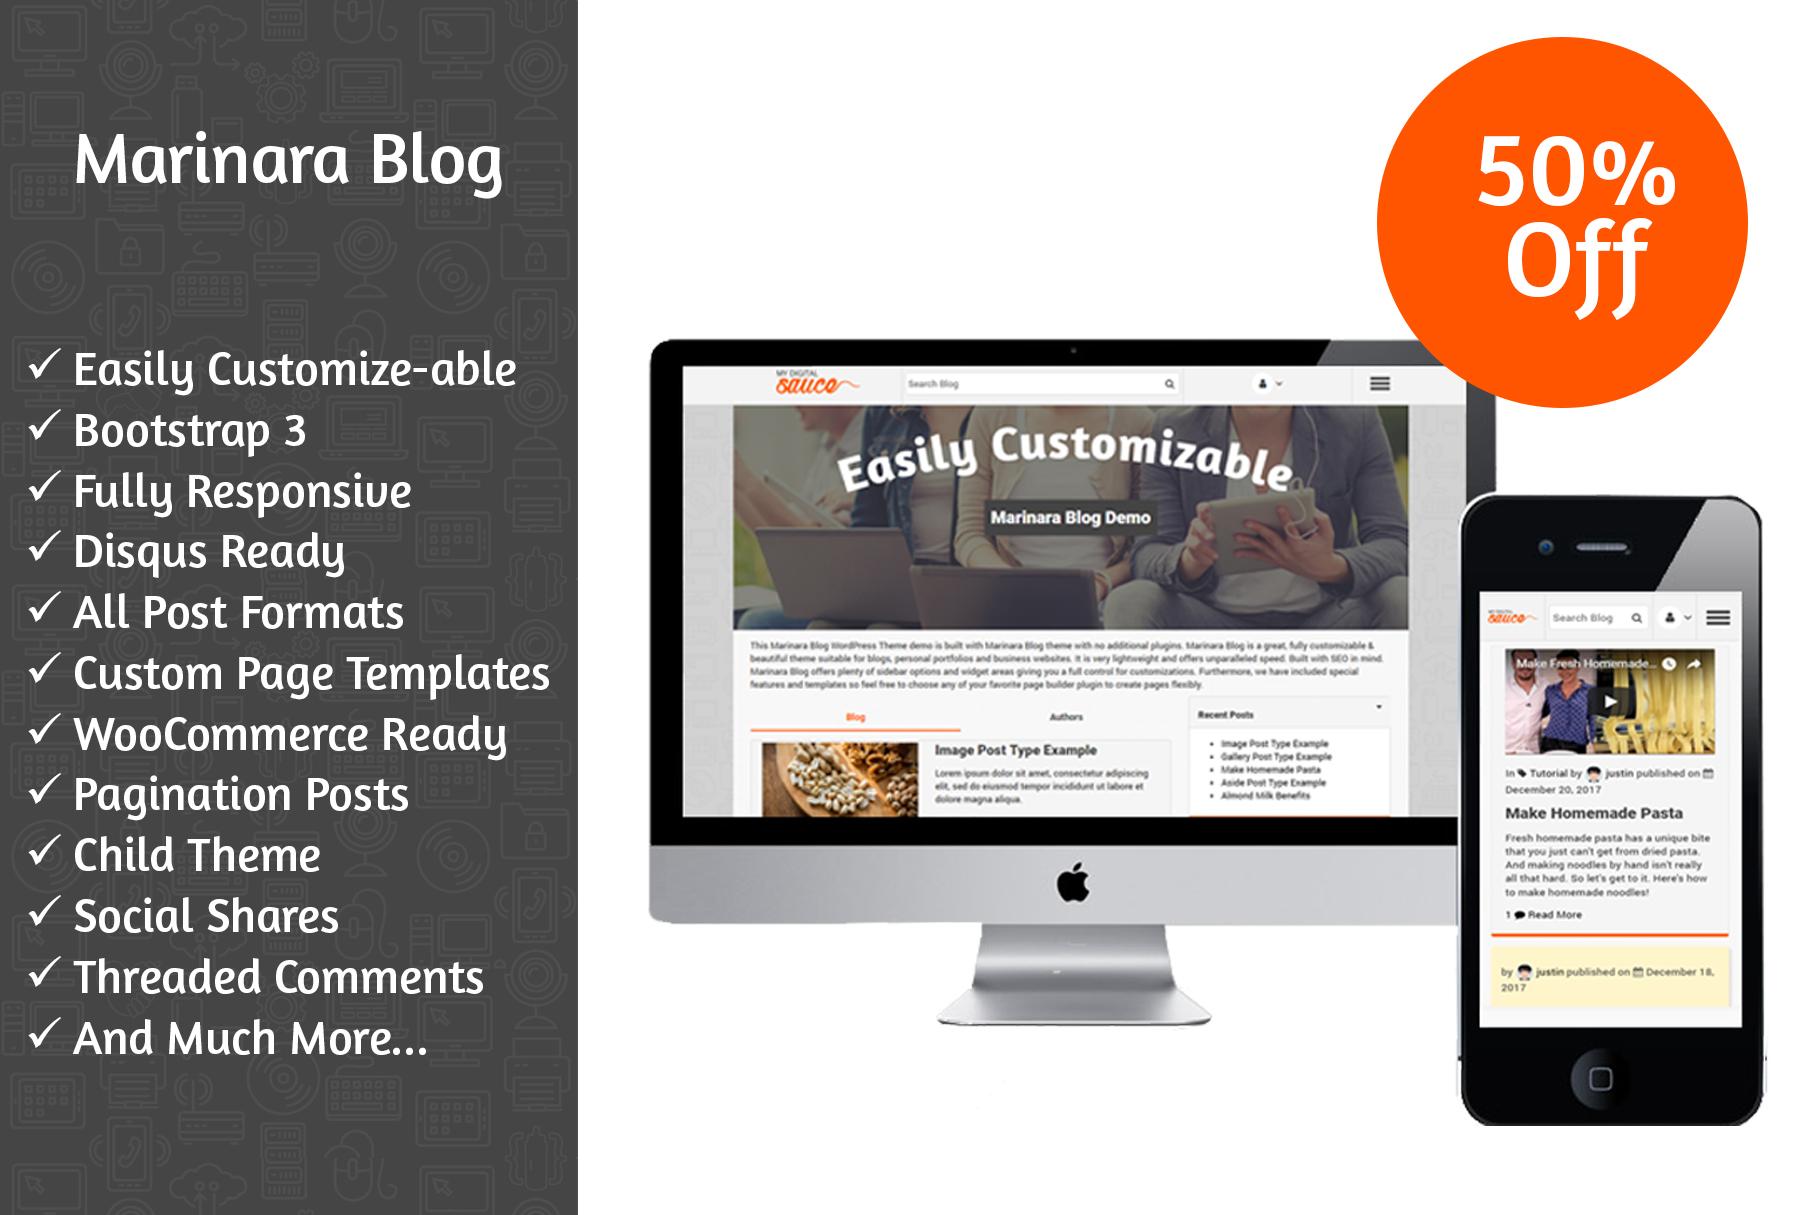 Marinara Blog